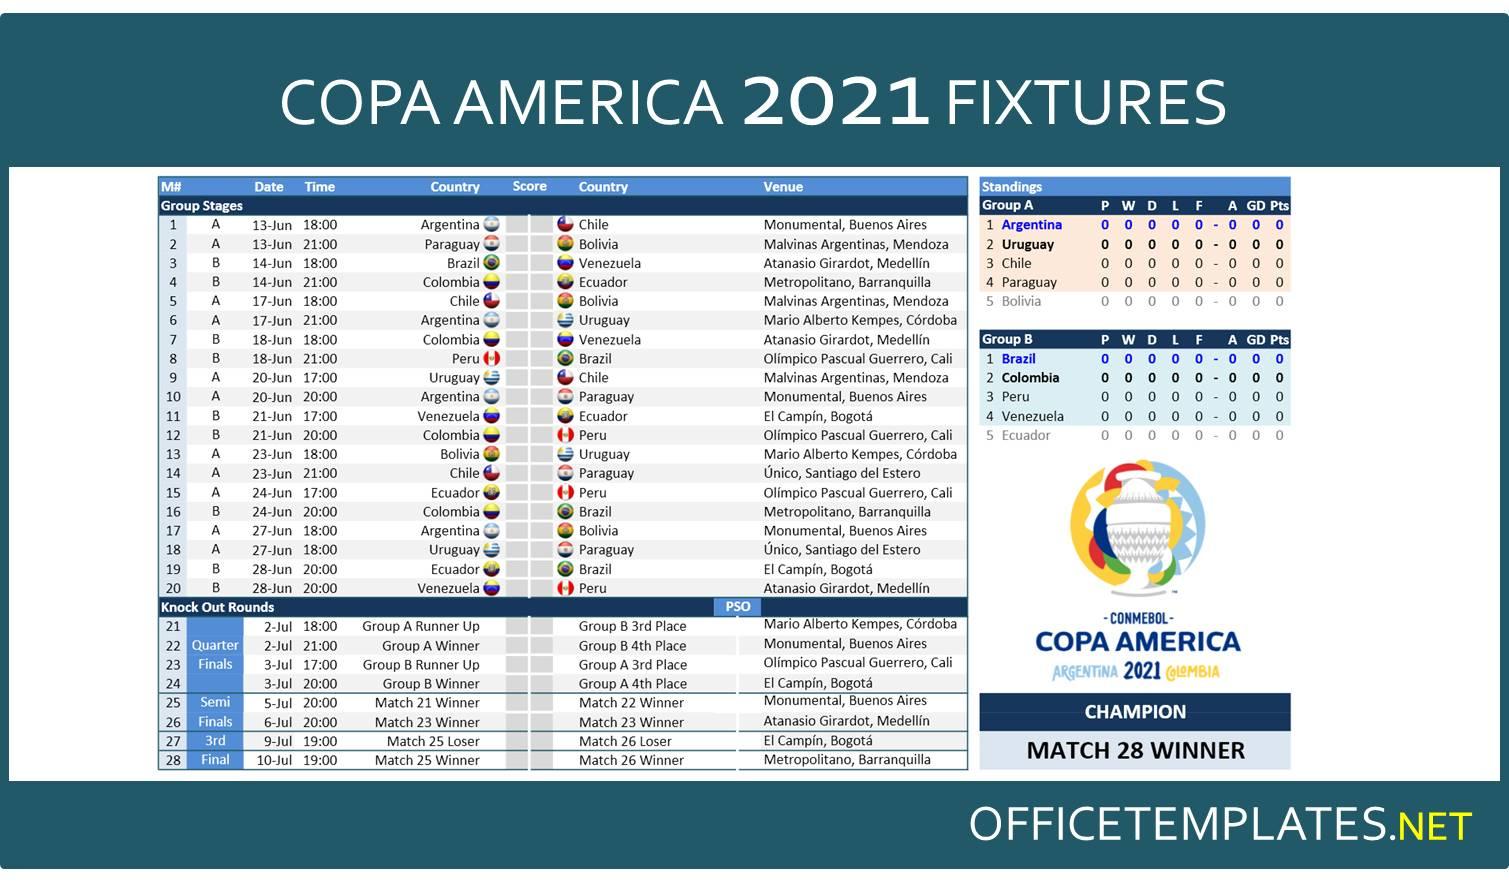 Calendrier Copa America 2022 Pdf Copa America 2021 Schedule and Scoresheet » OFFICETEMPLATES.NET